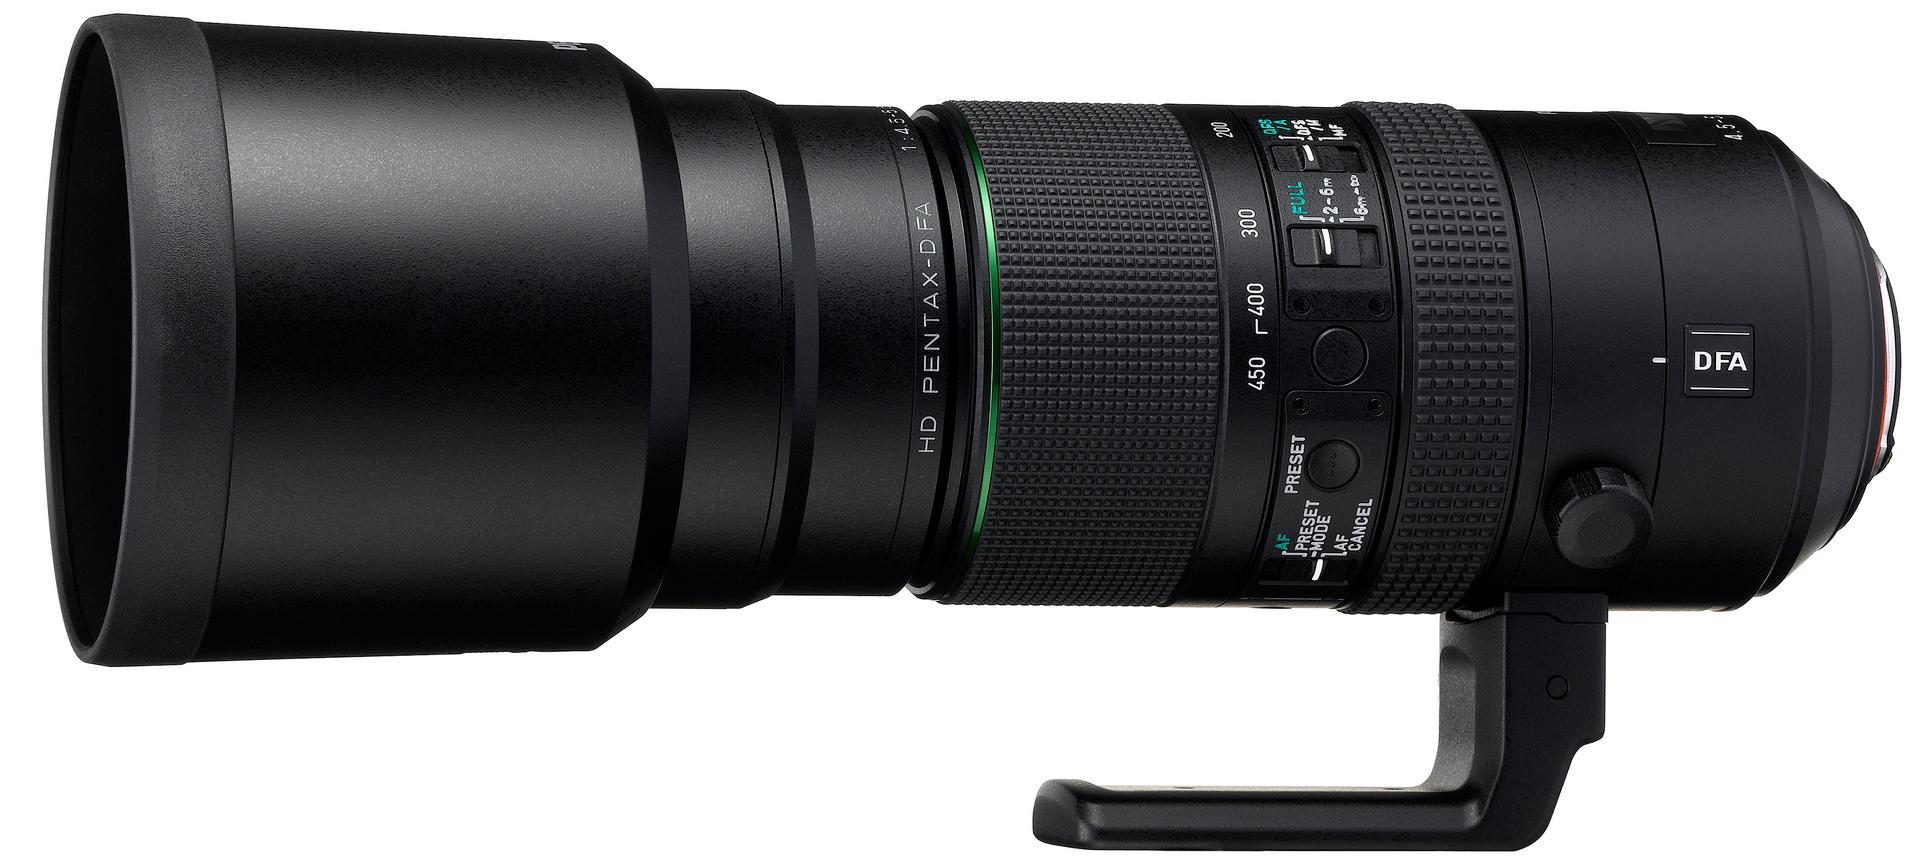 Ricoh-Pentax-HD-D-FA-150-450mm-Youthephotographer-Lens-Gears